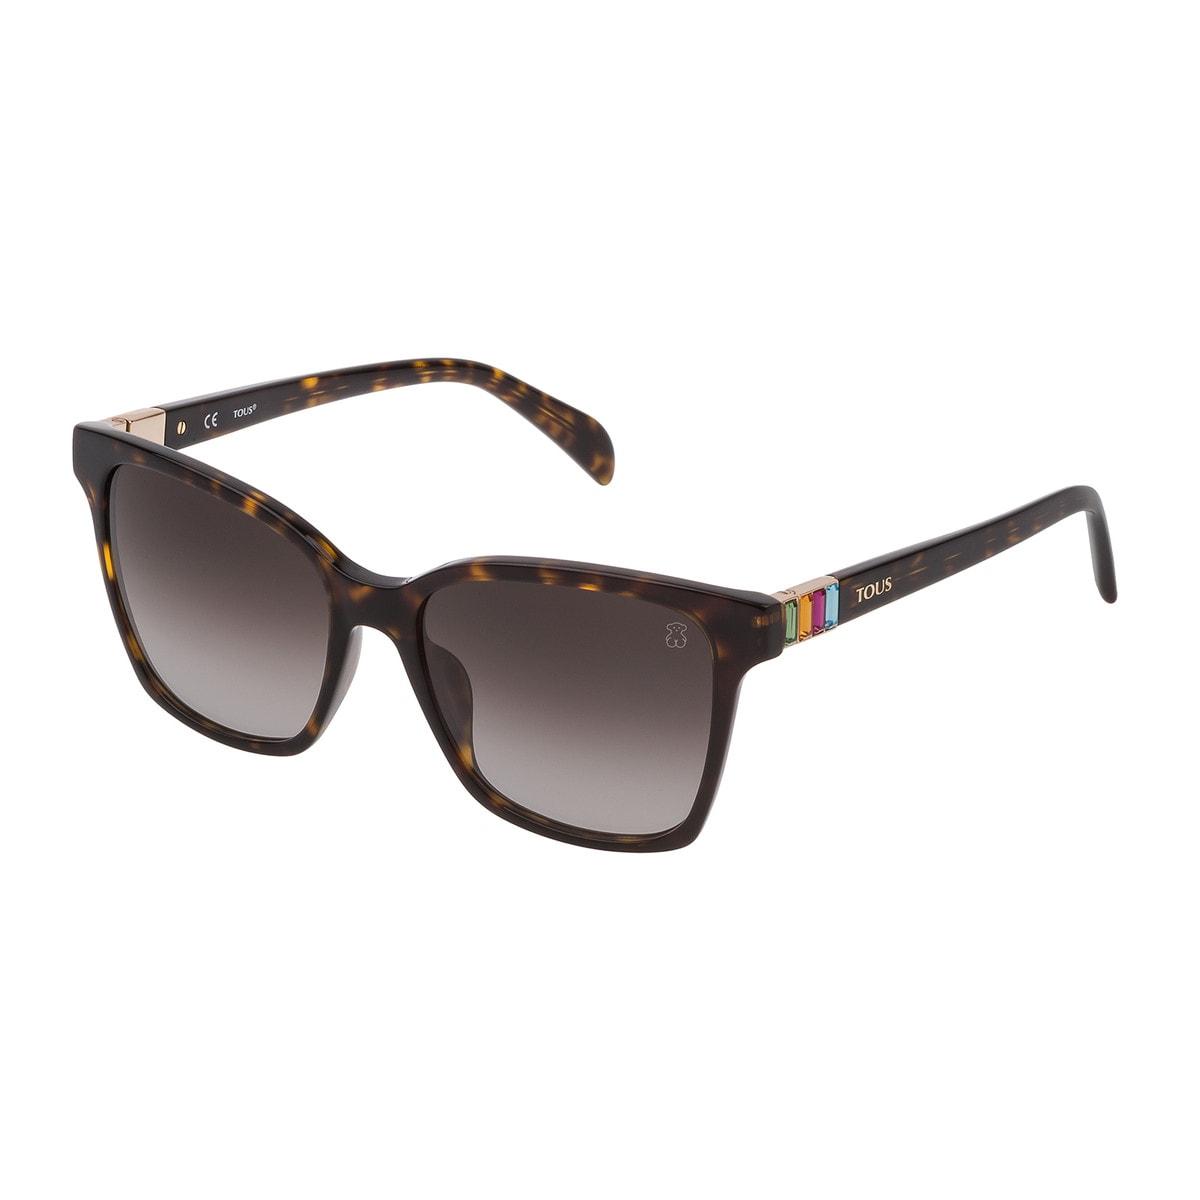 Brown Acetate Gems Squared Sunglasses